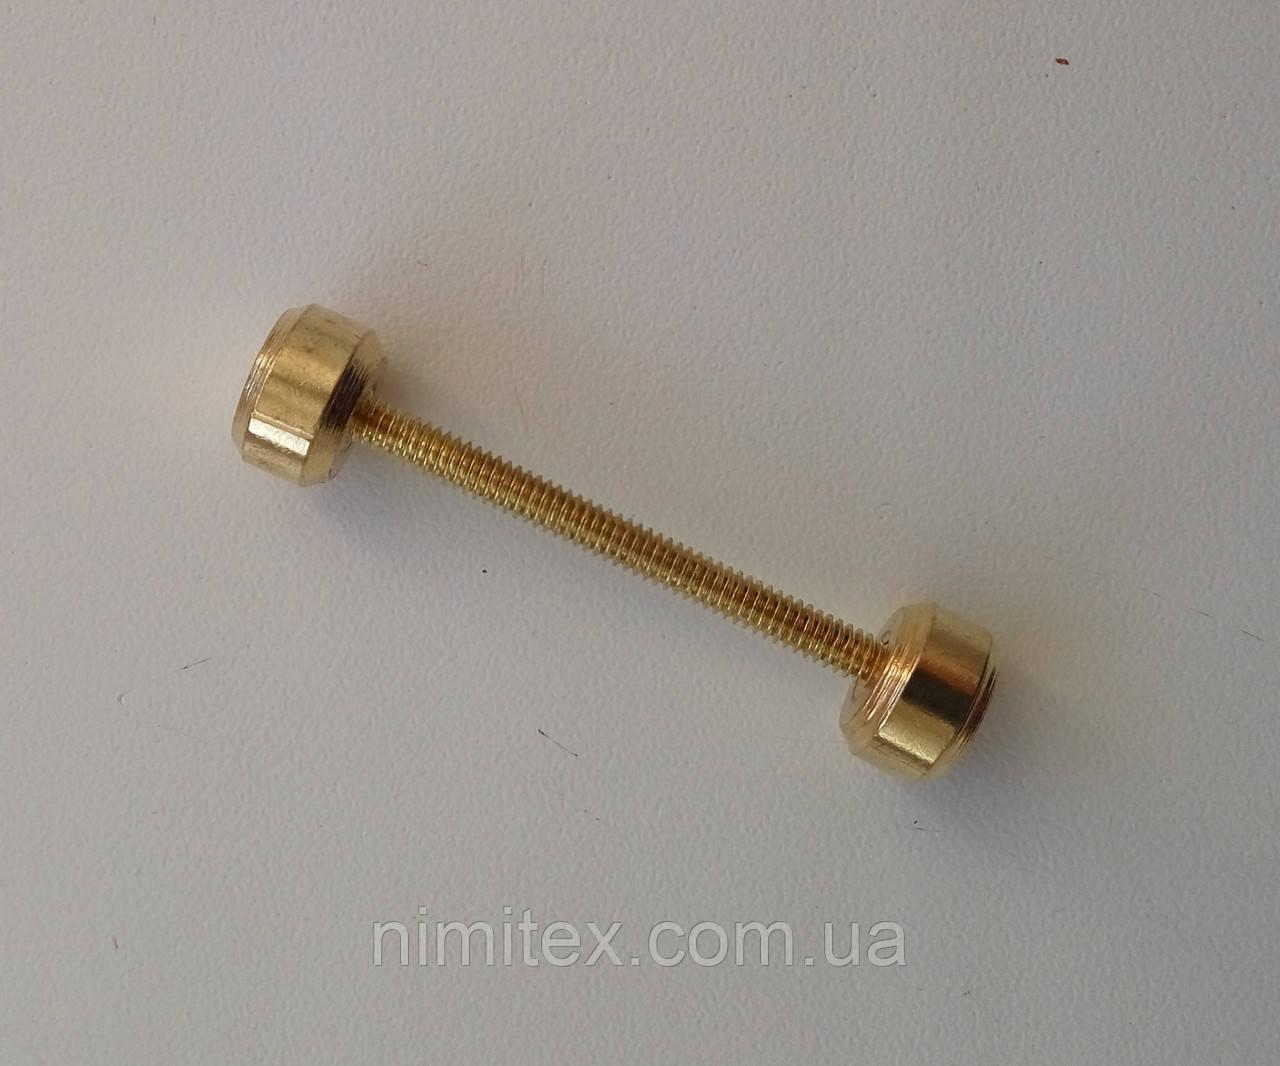 Штанга 30 мм золото